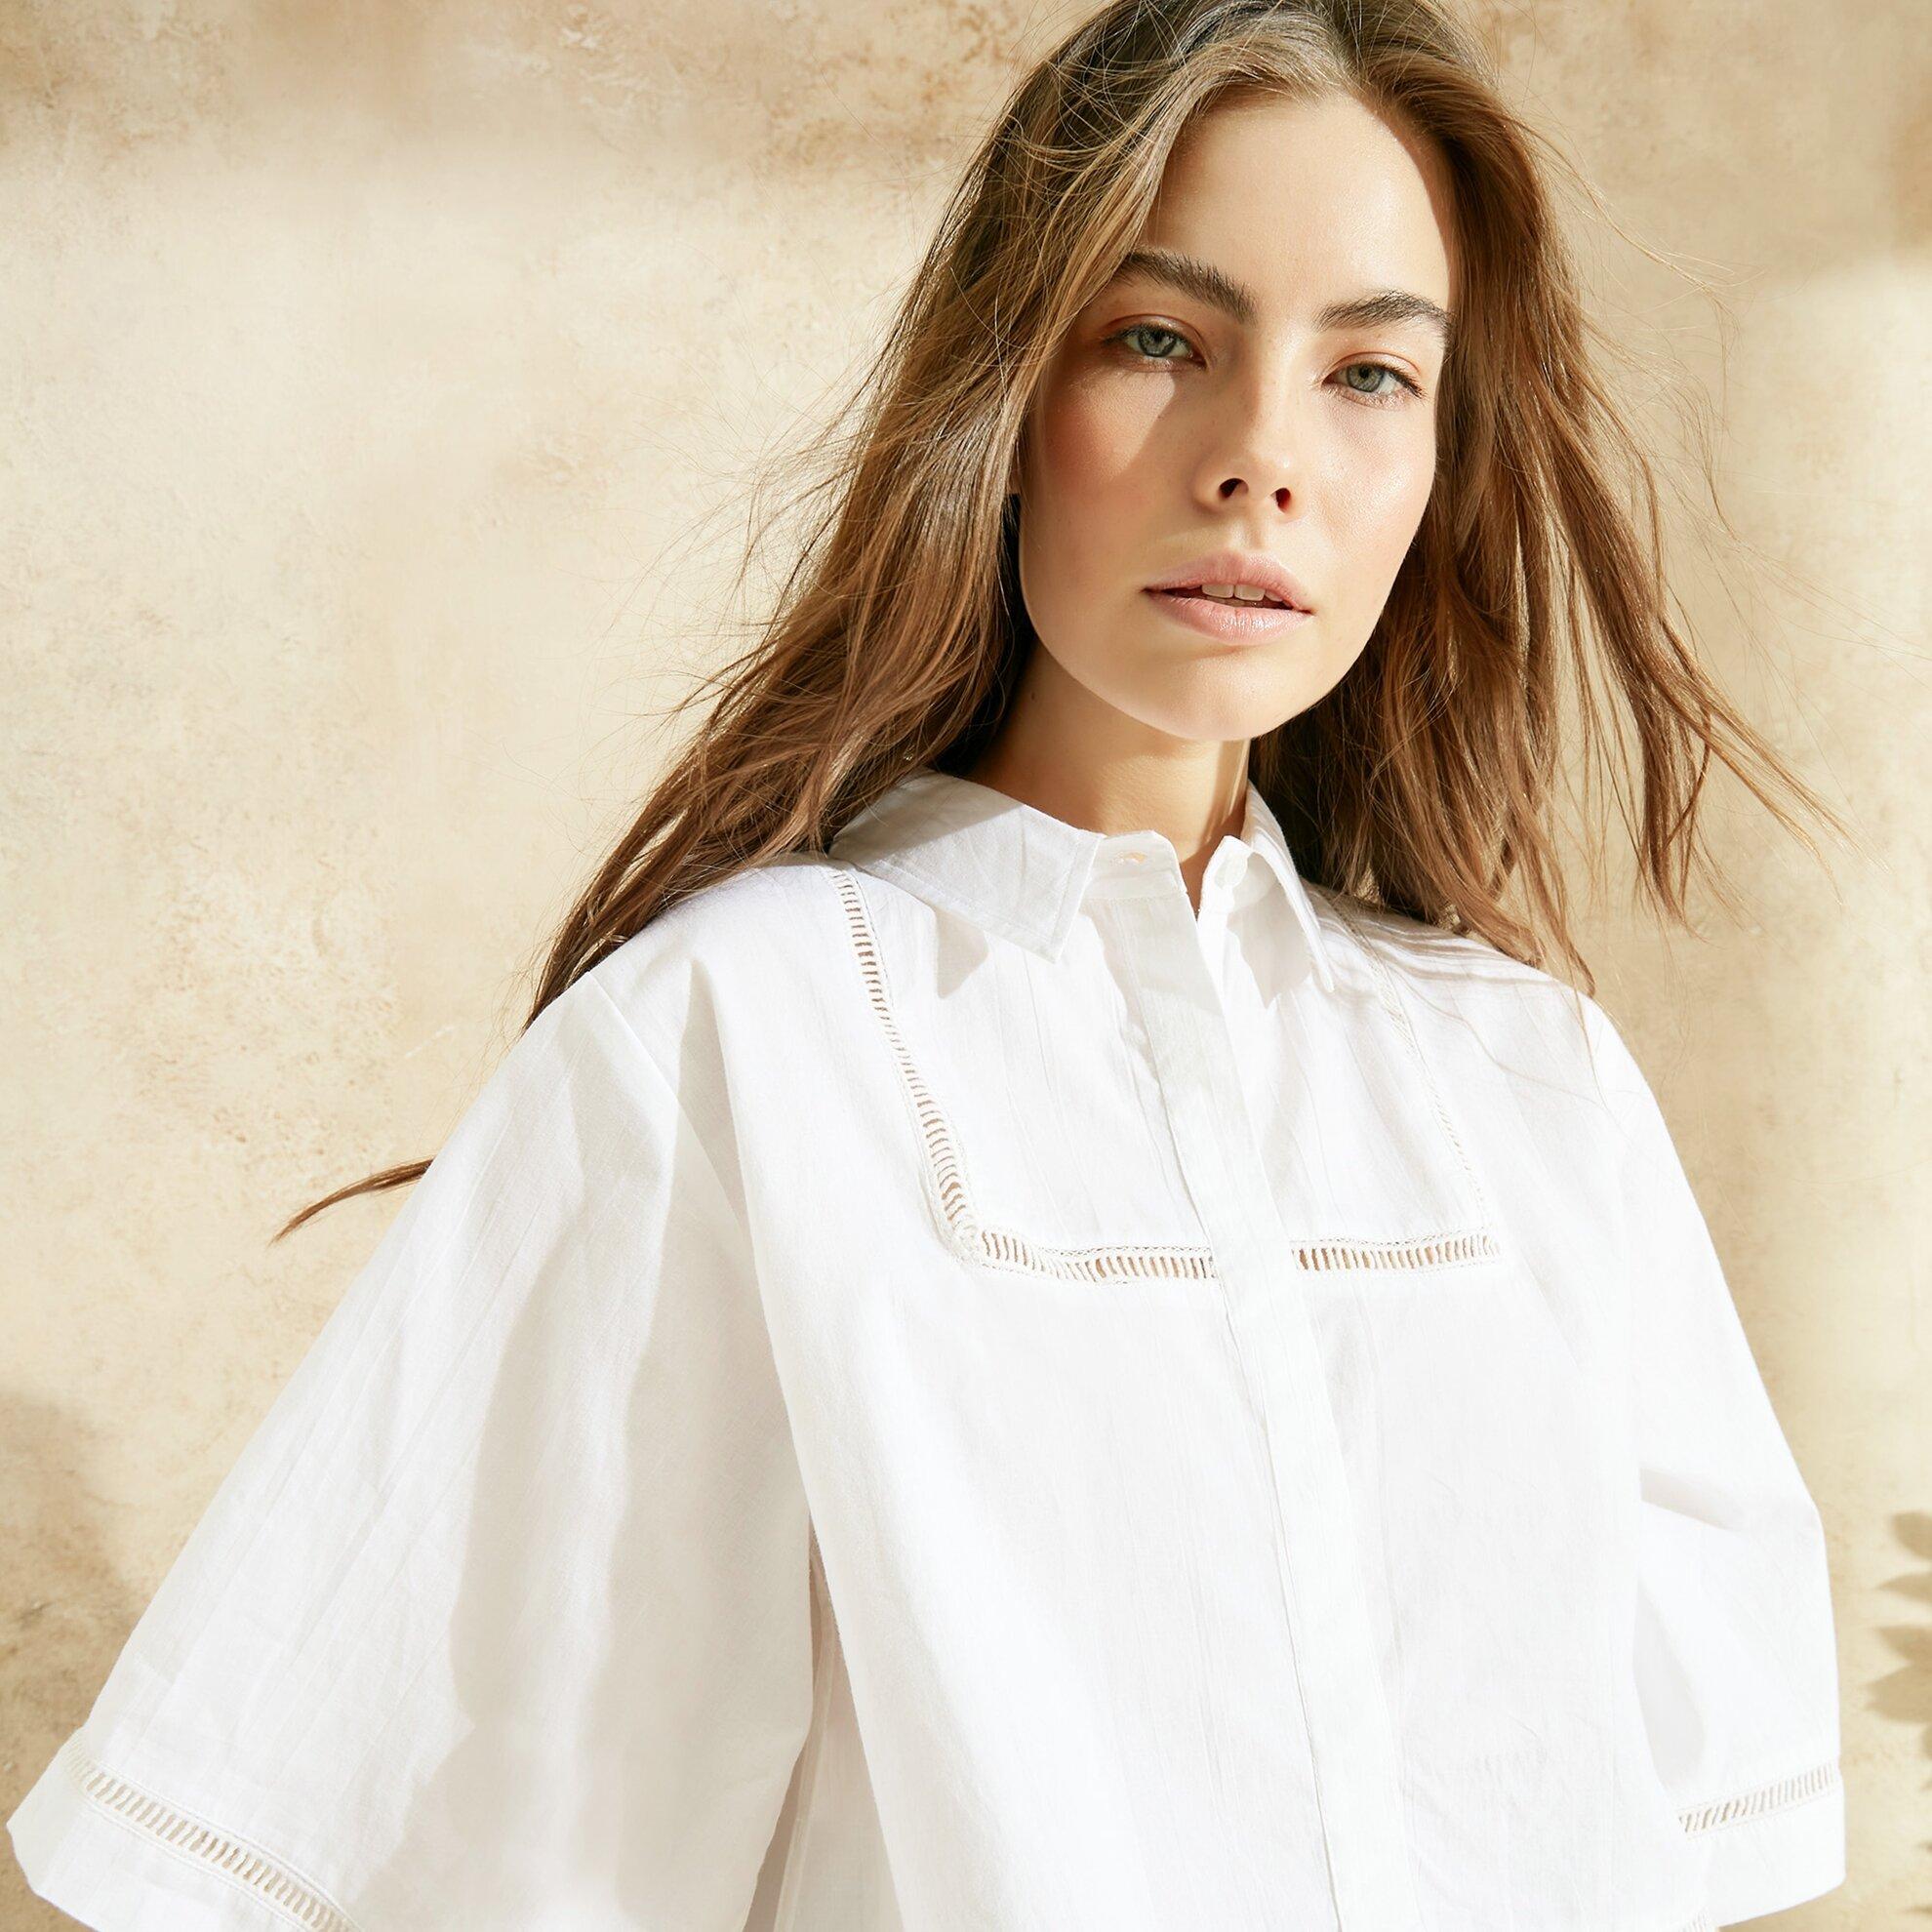 Biye Detaylı Rahat Kalıp Gömlek